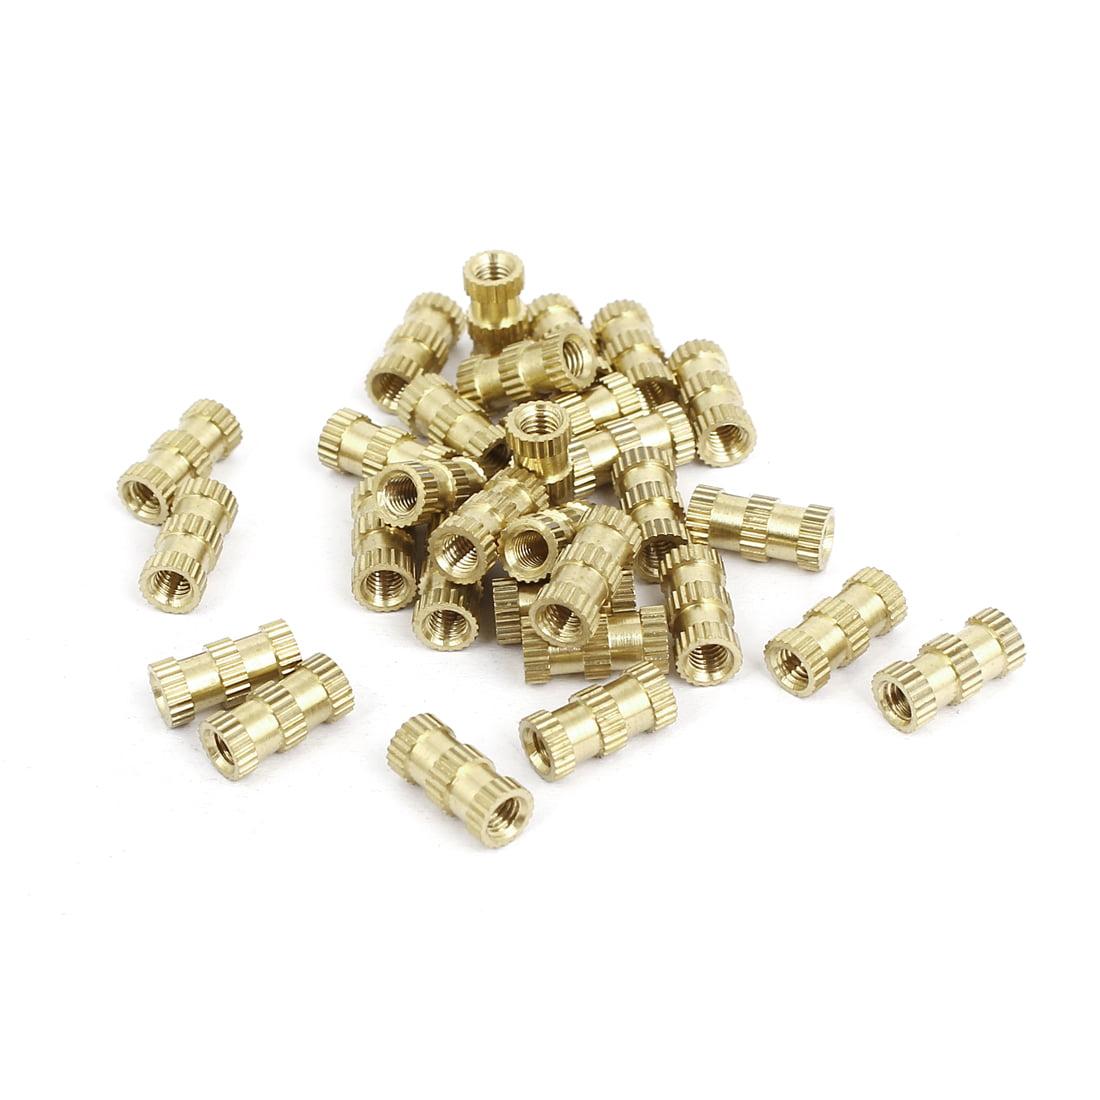 M3x10mmx4.8mm Brass Knurled Threaded Nut Insert Embedded Nuts Gold Tone 30pcs